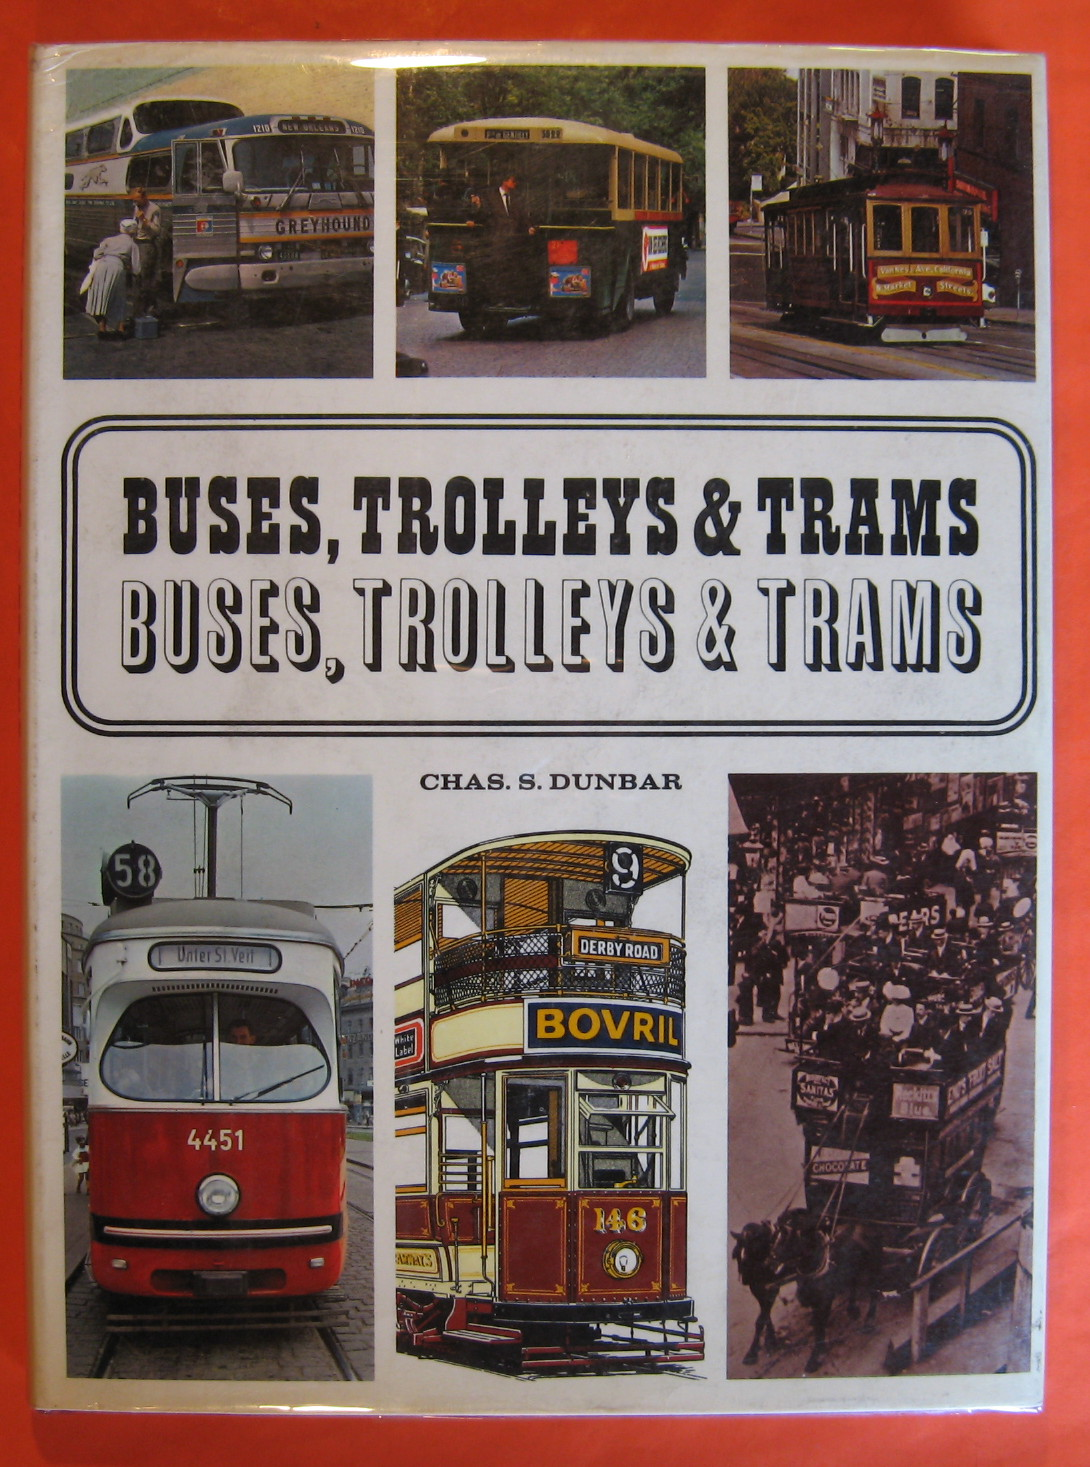 Buses, Trolleys & Trams, Dunbar, Chas. S.